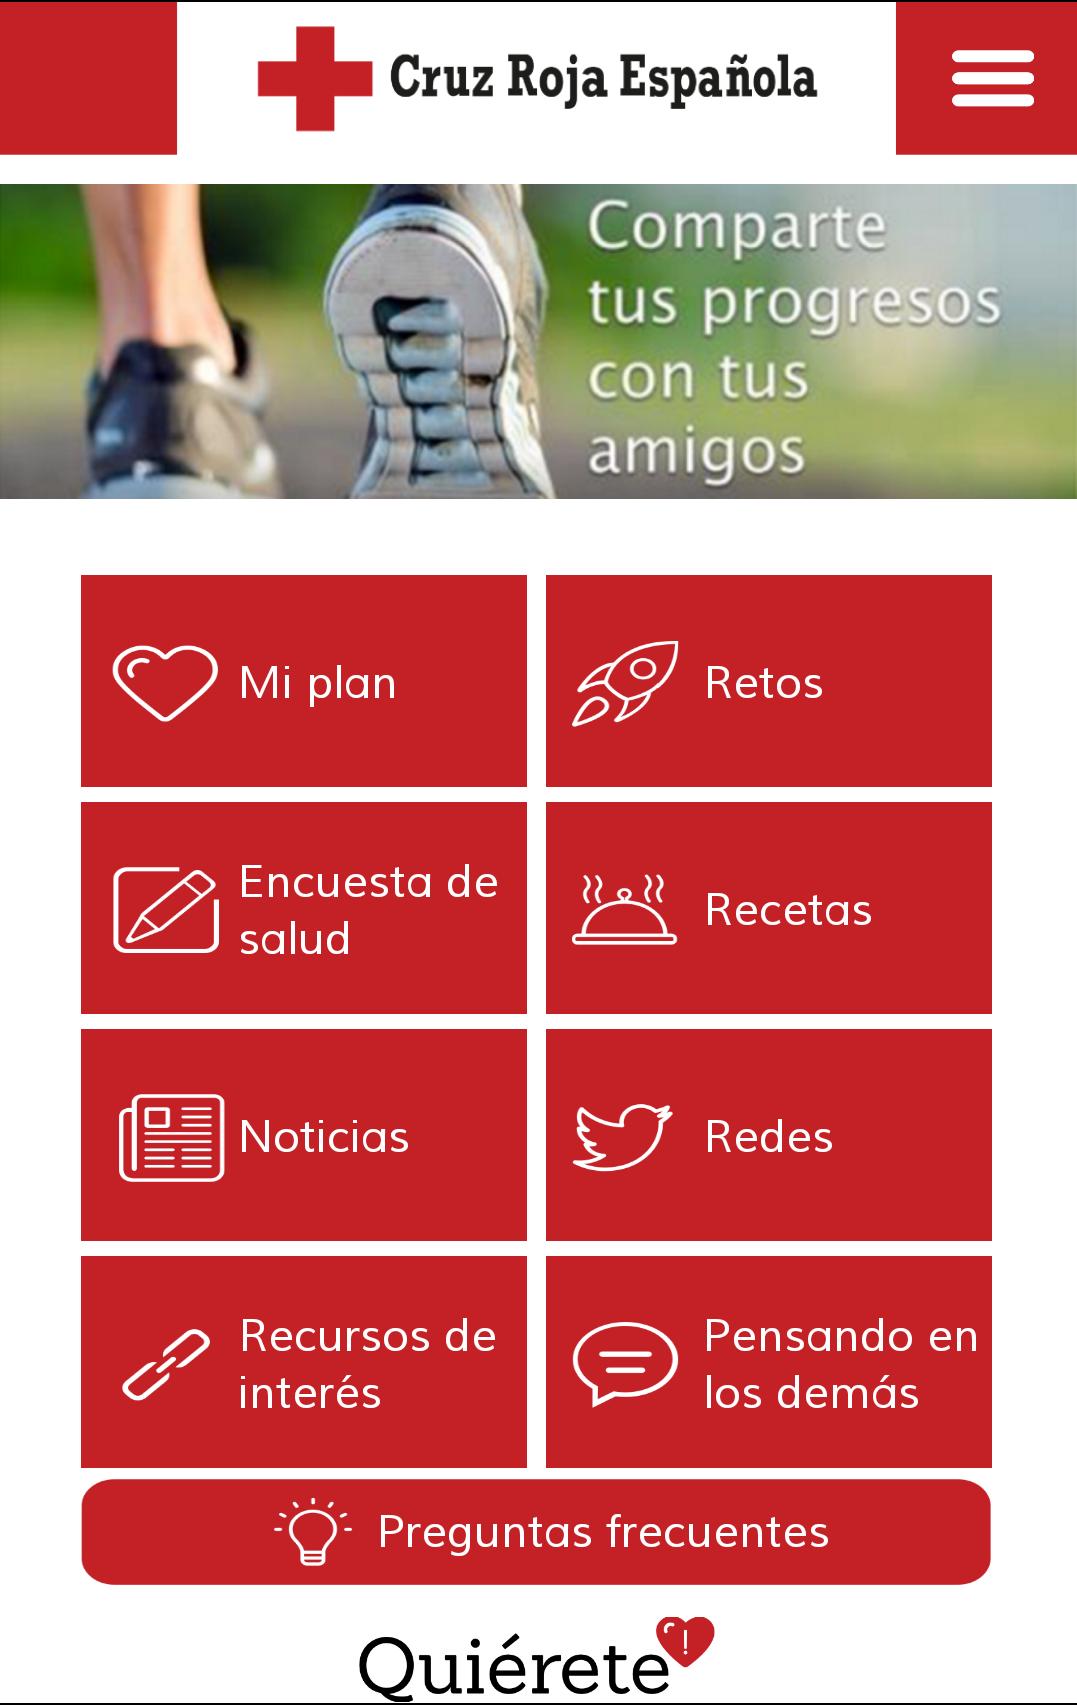 Cruz Roja presenta la app 'Quiérete'